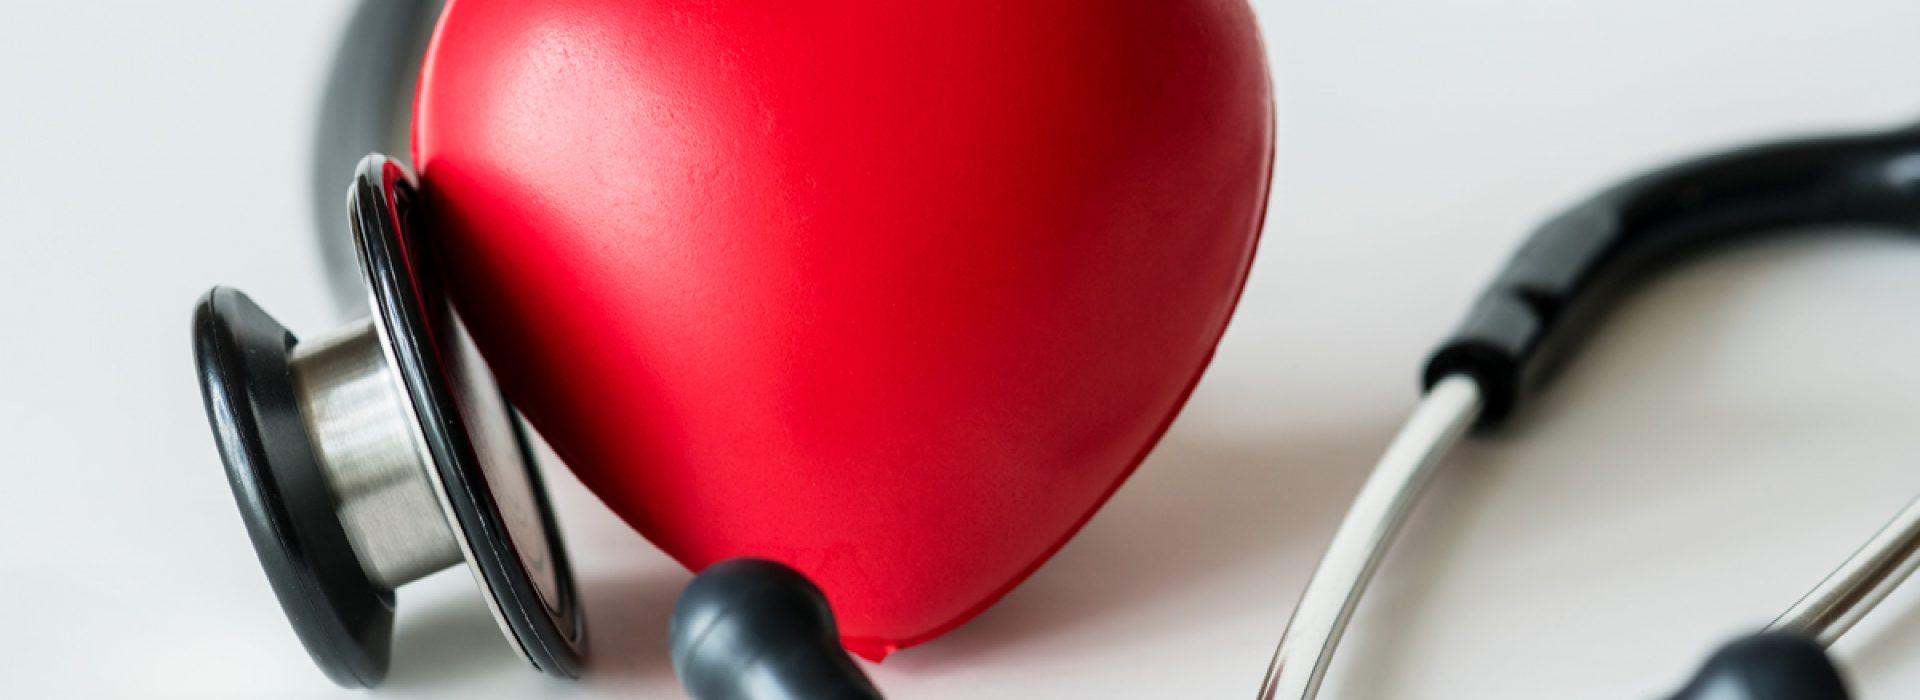 salud-cardiaca-homocisteina